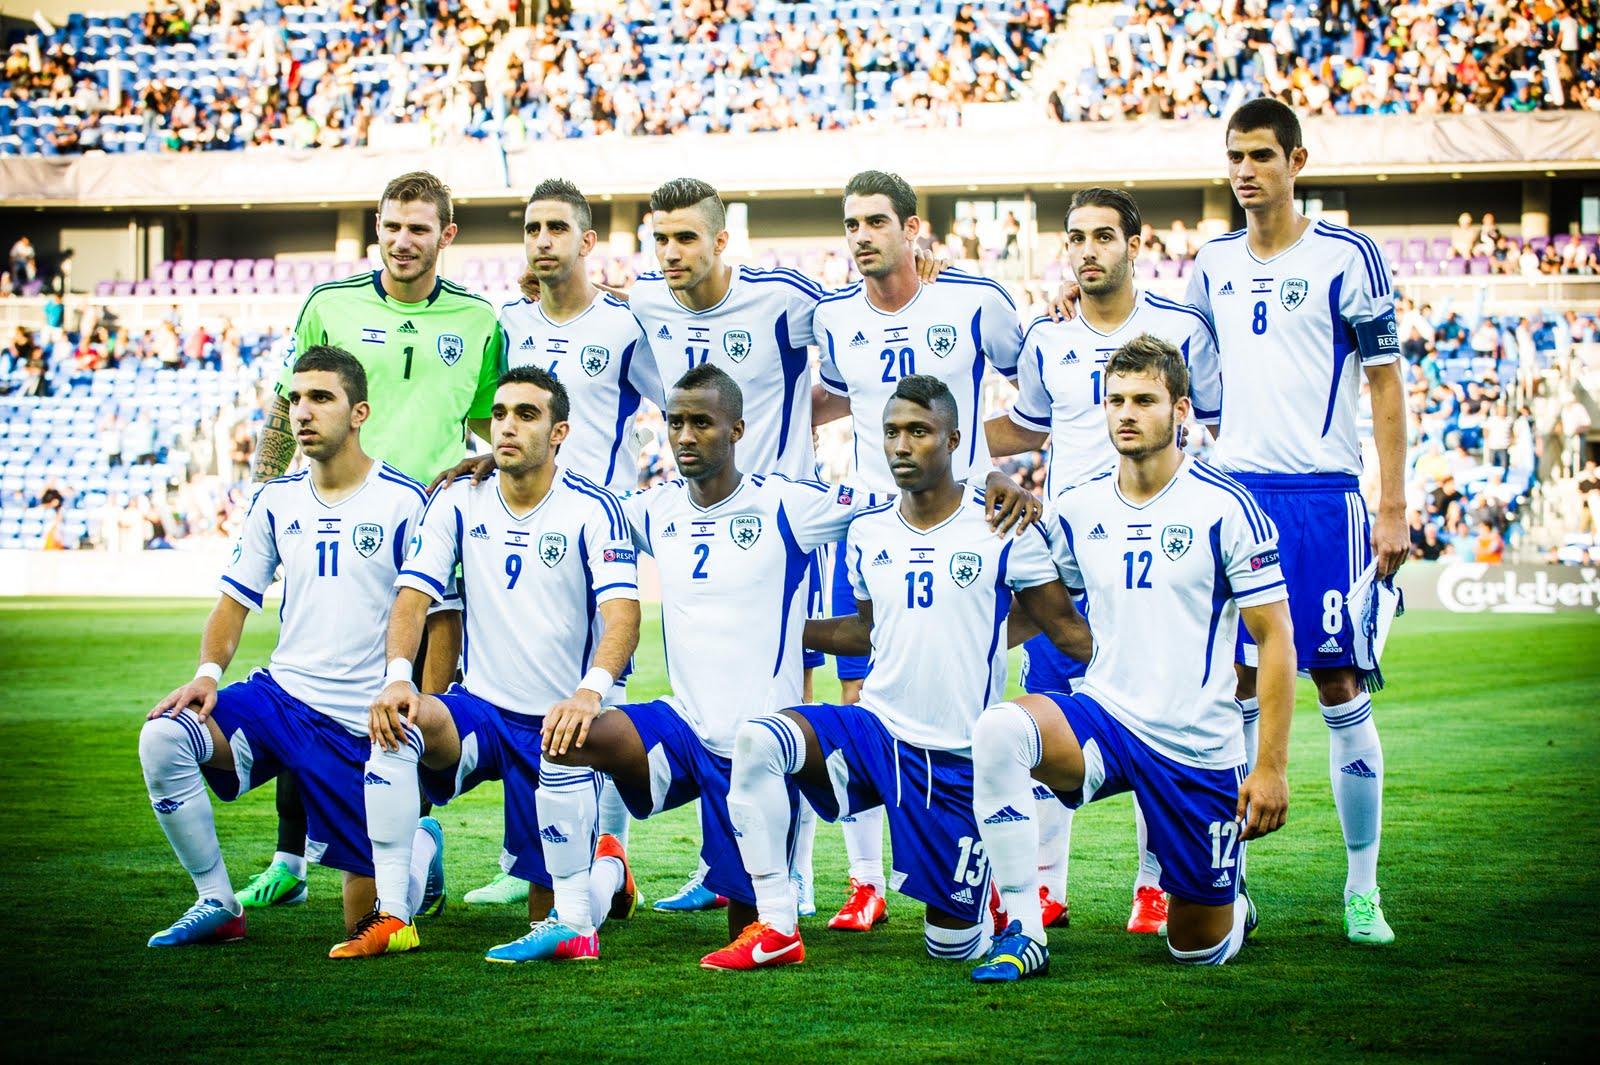 Adidas is No Longer Sponsoring the Israel Football Association